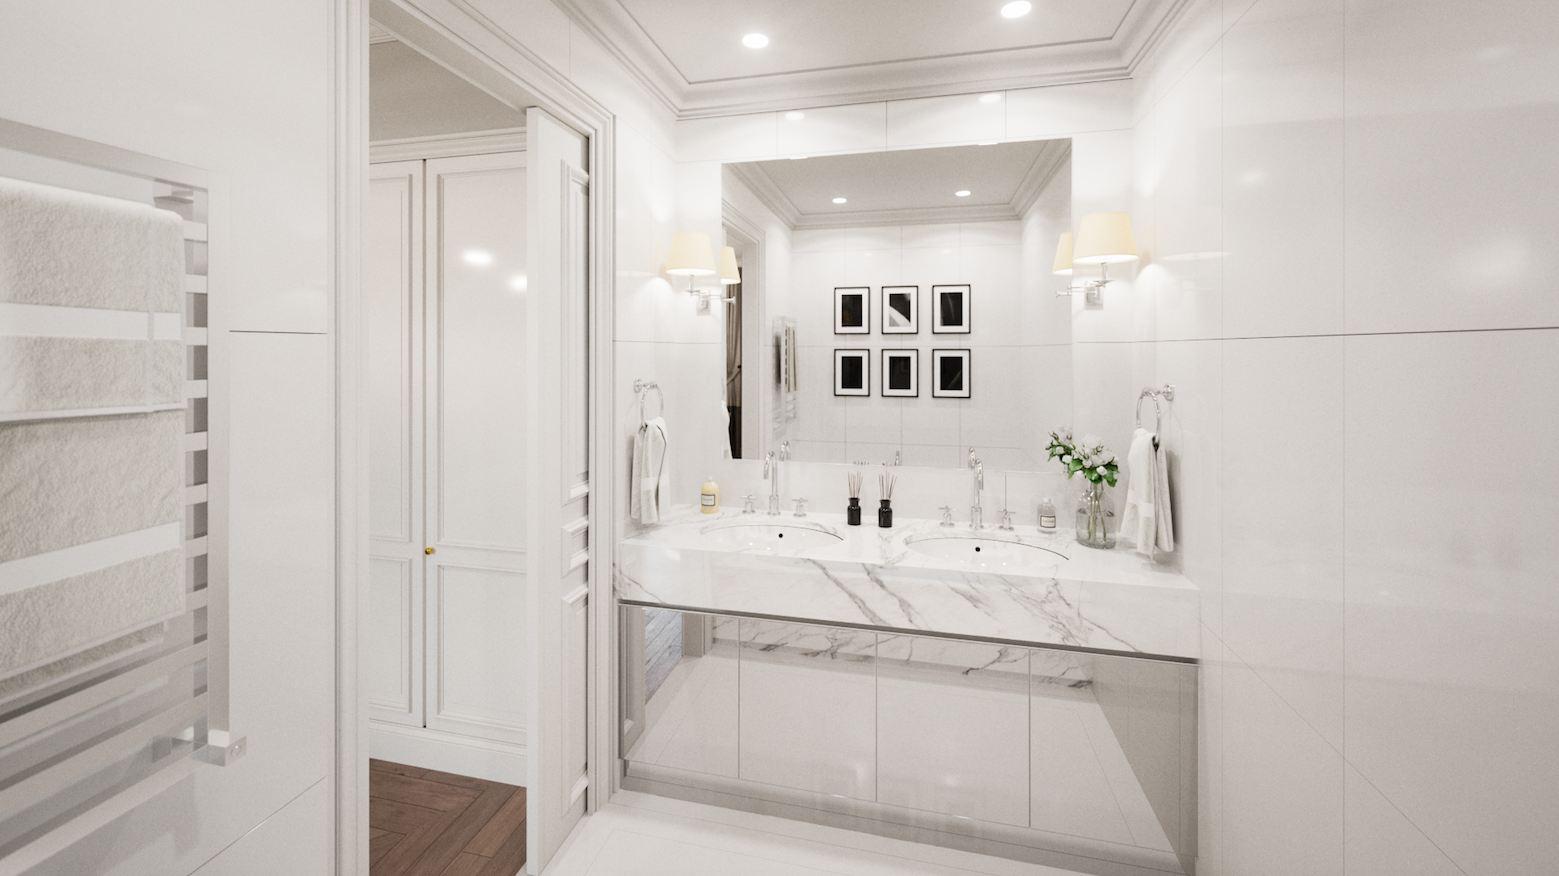 Additional photo for property listing at Paris VII - Exceptional Private mansion  Paris, Ile-De-France 75007 France